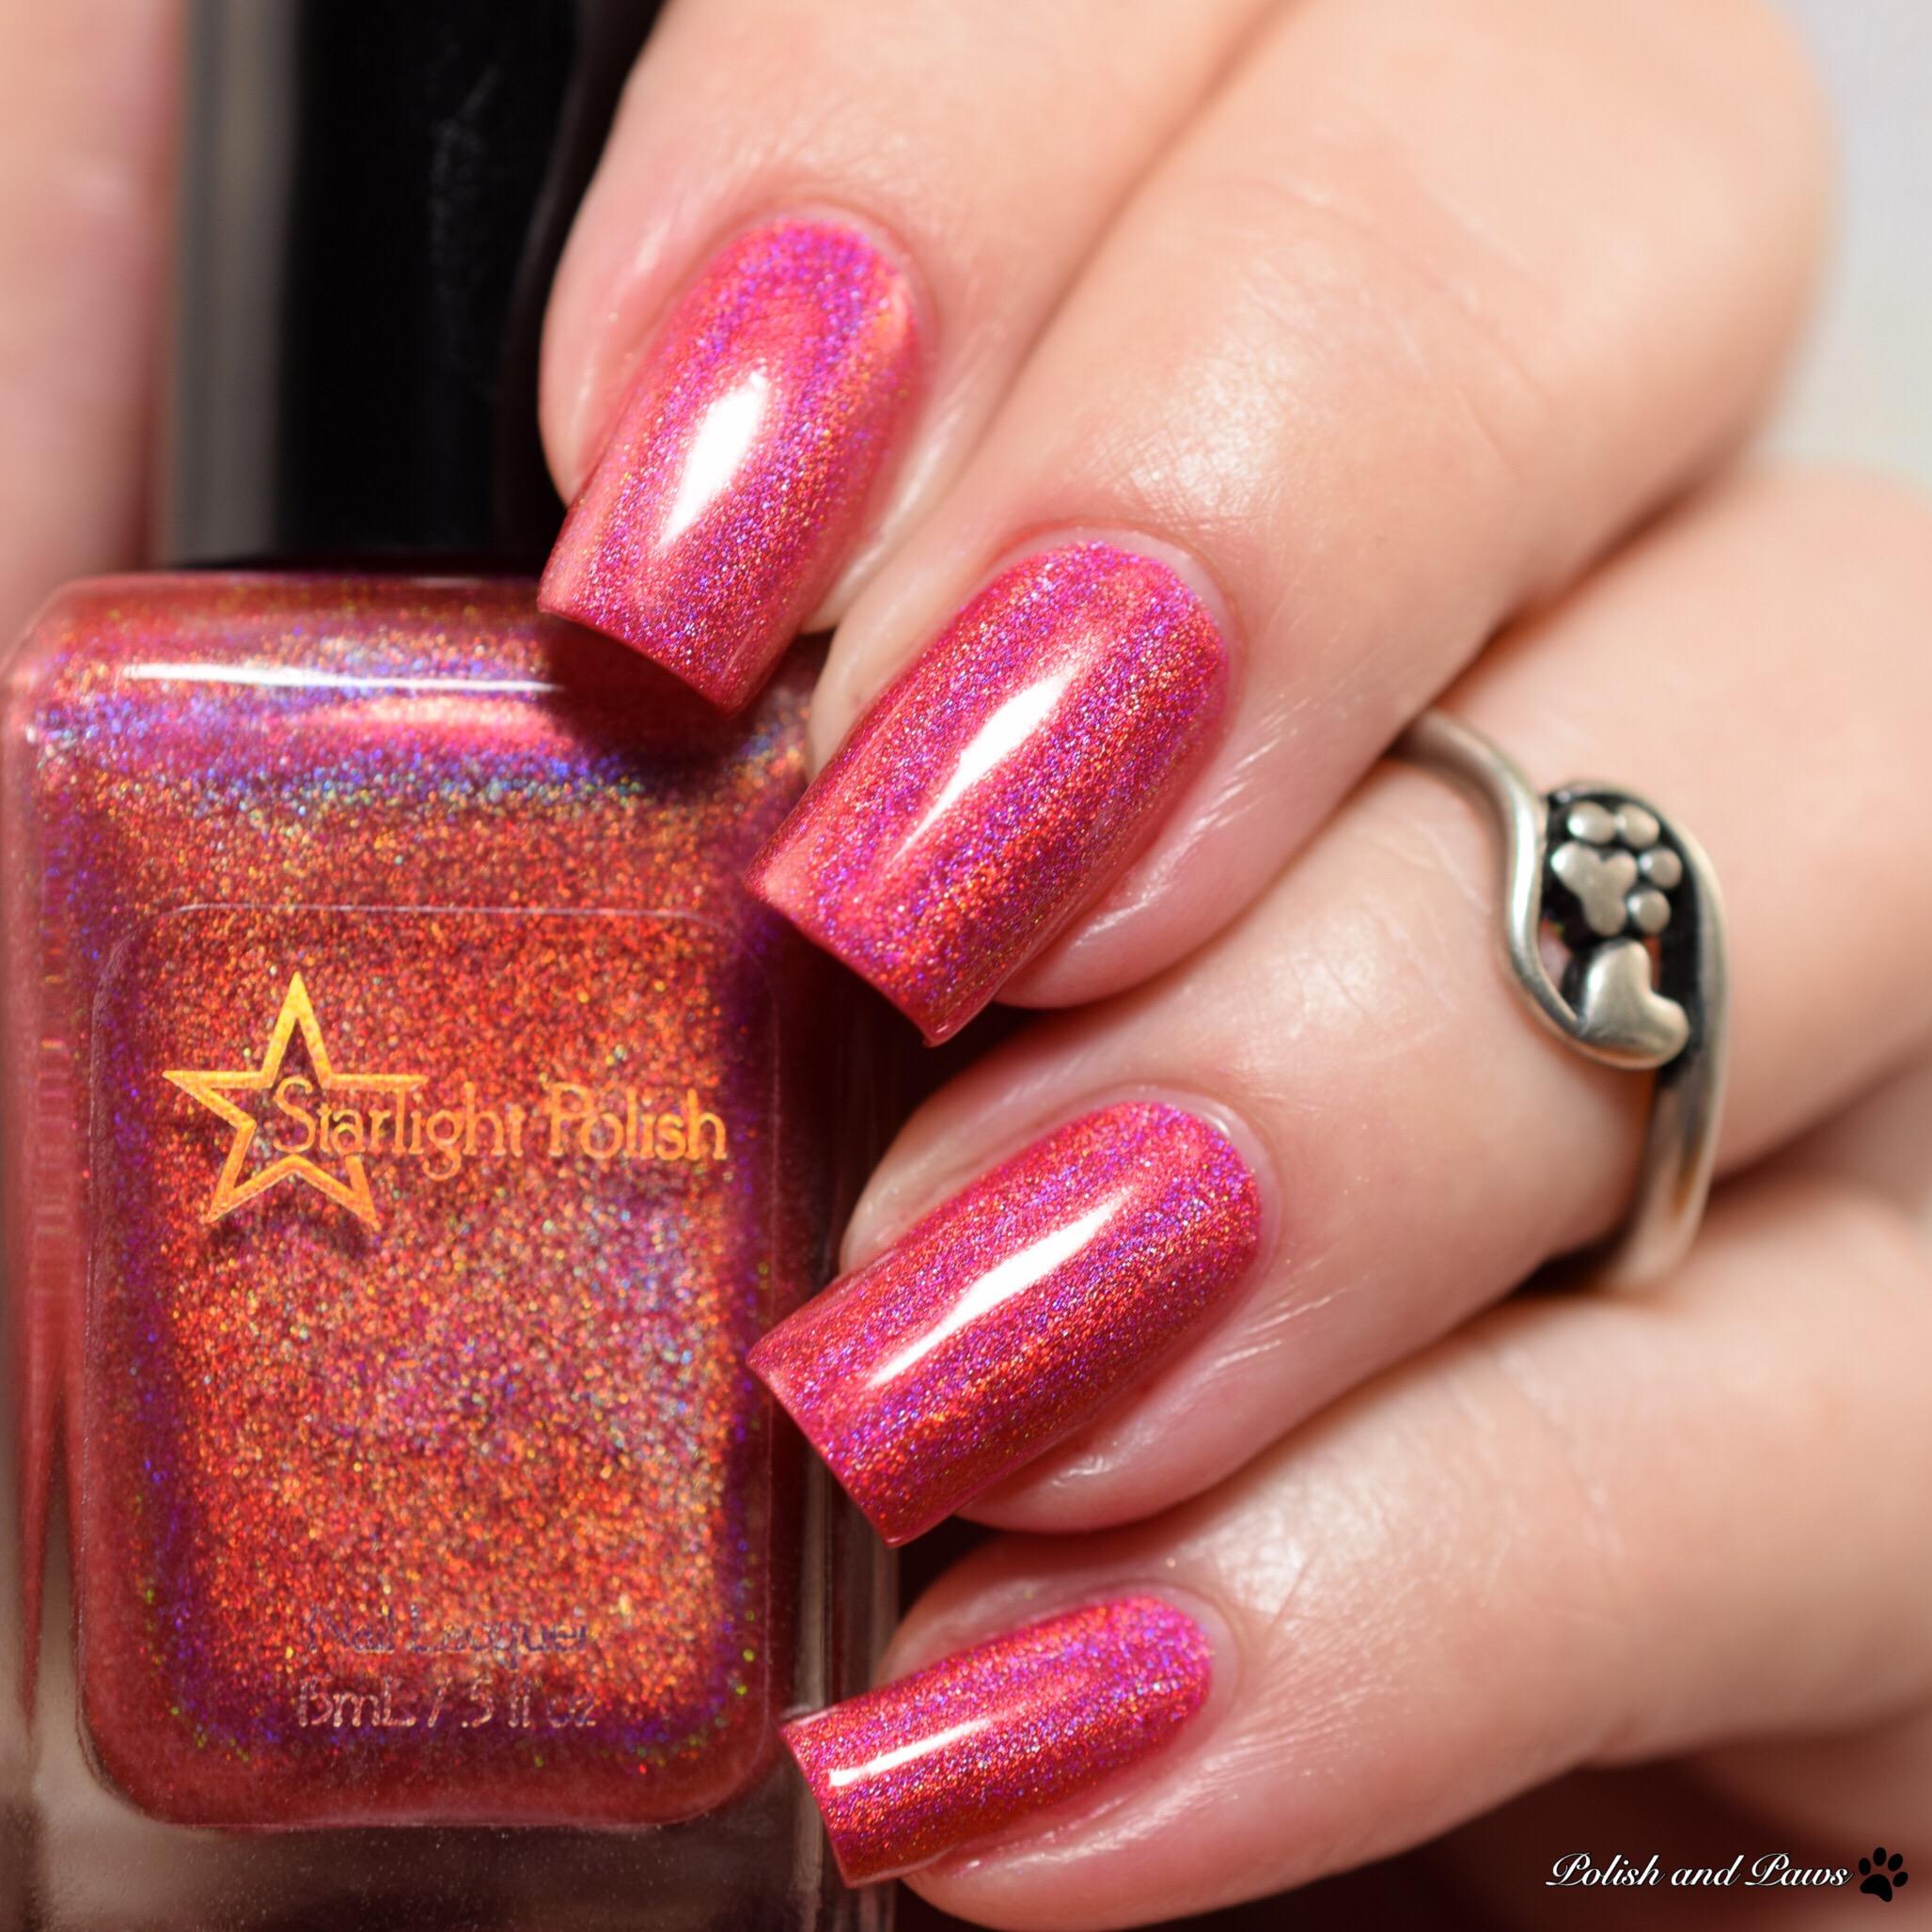 Starlight Polish Pink Corazon